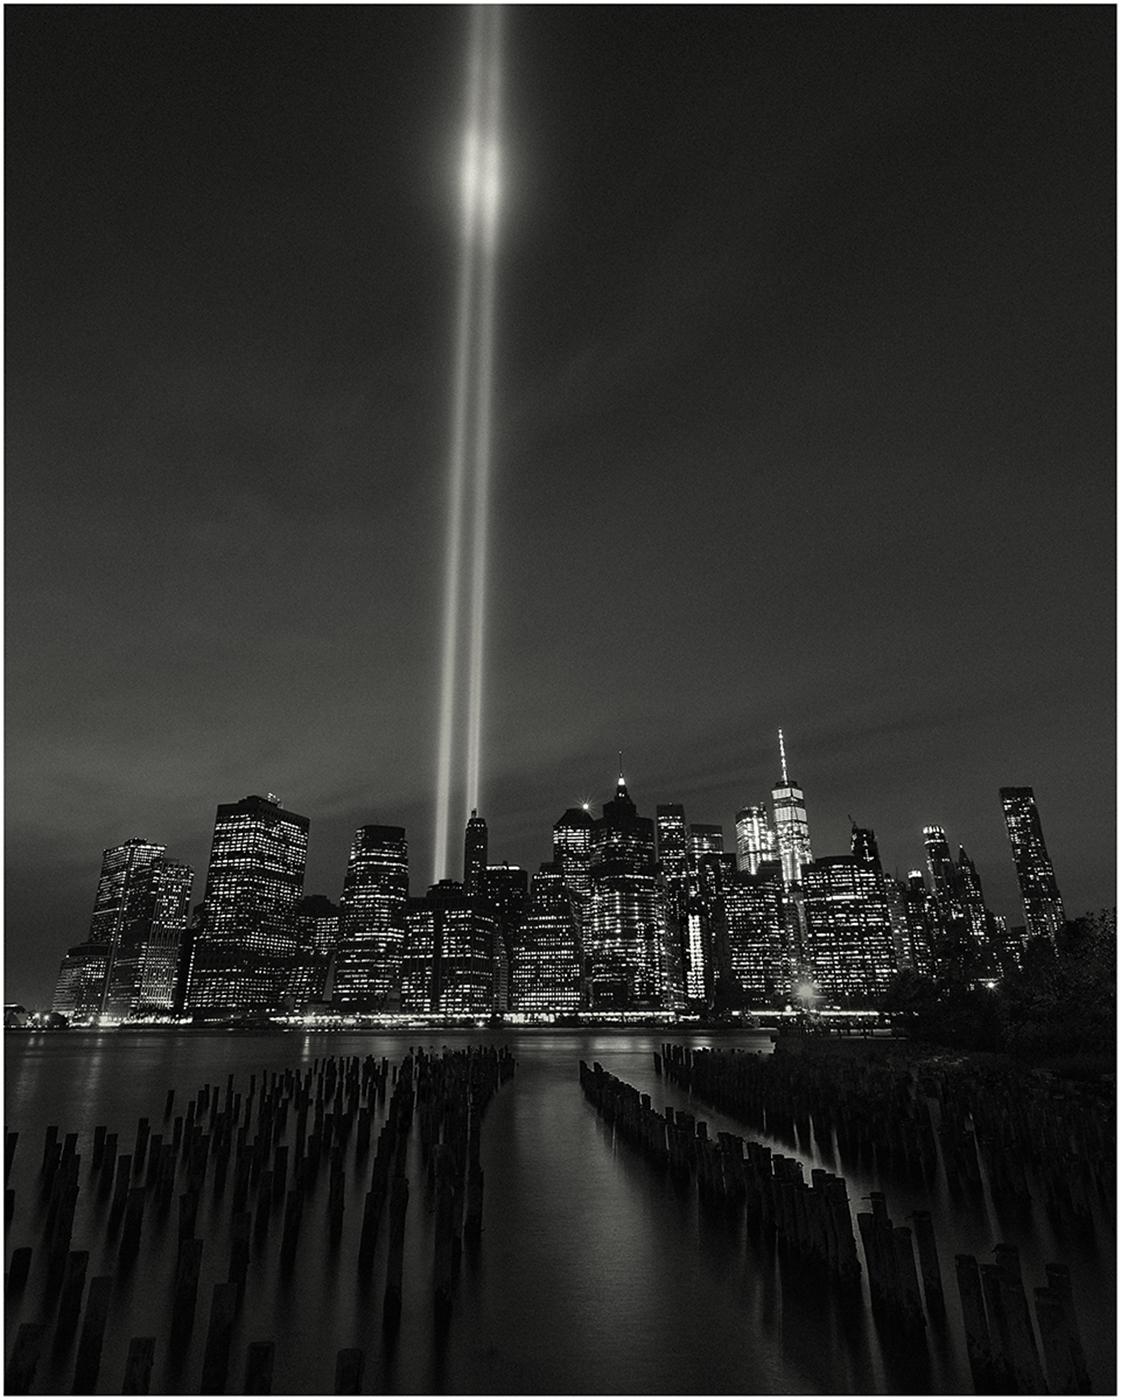 911 Memoral,NY 2017